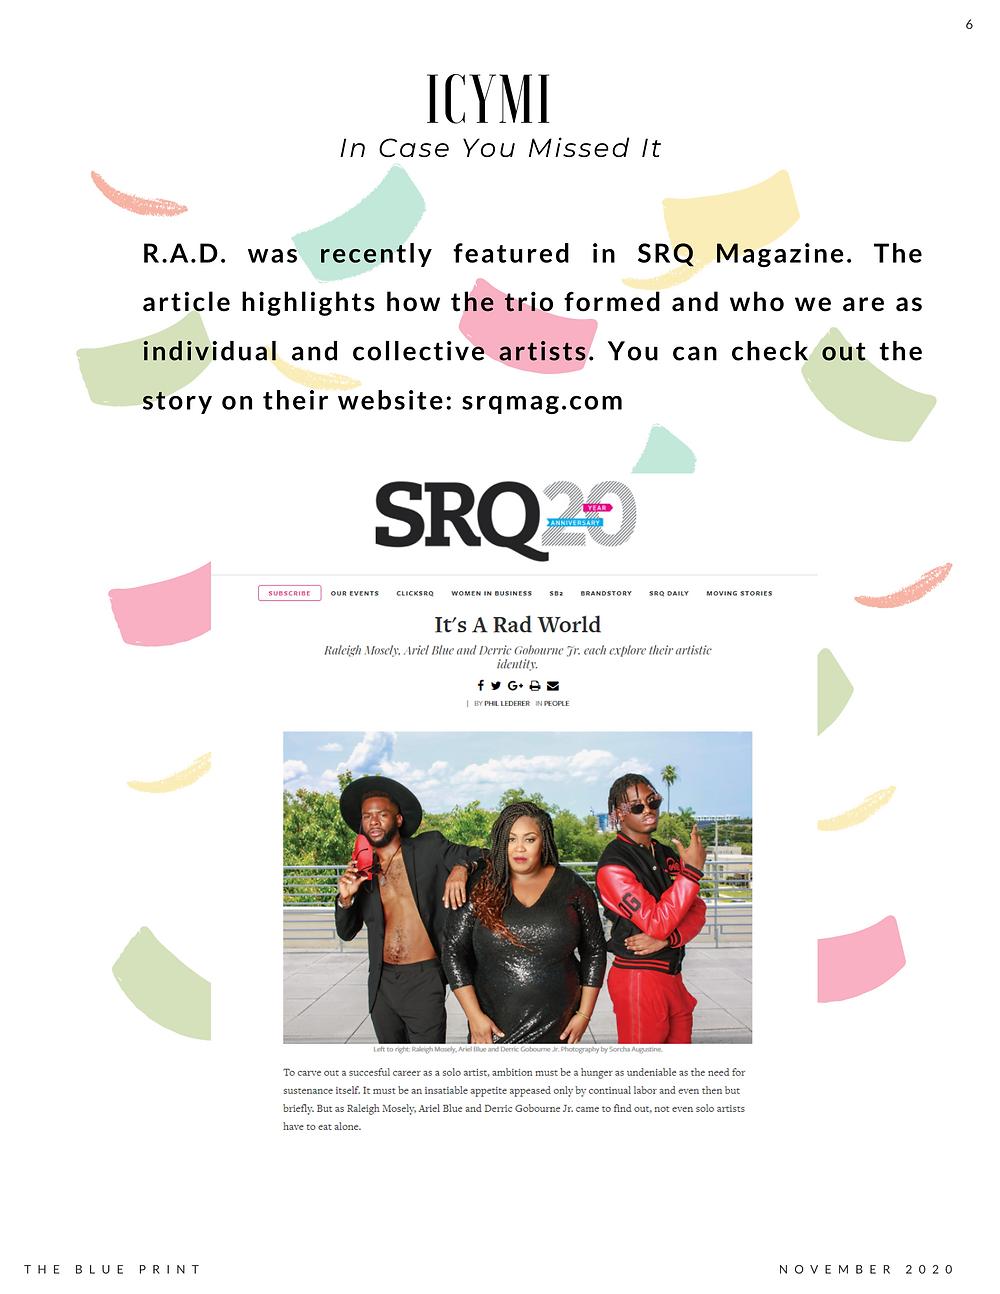 ICYMI: RAD in SRQ Magazine